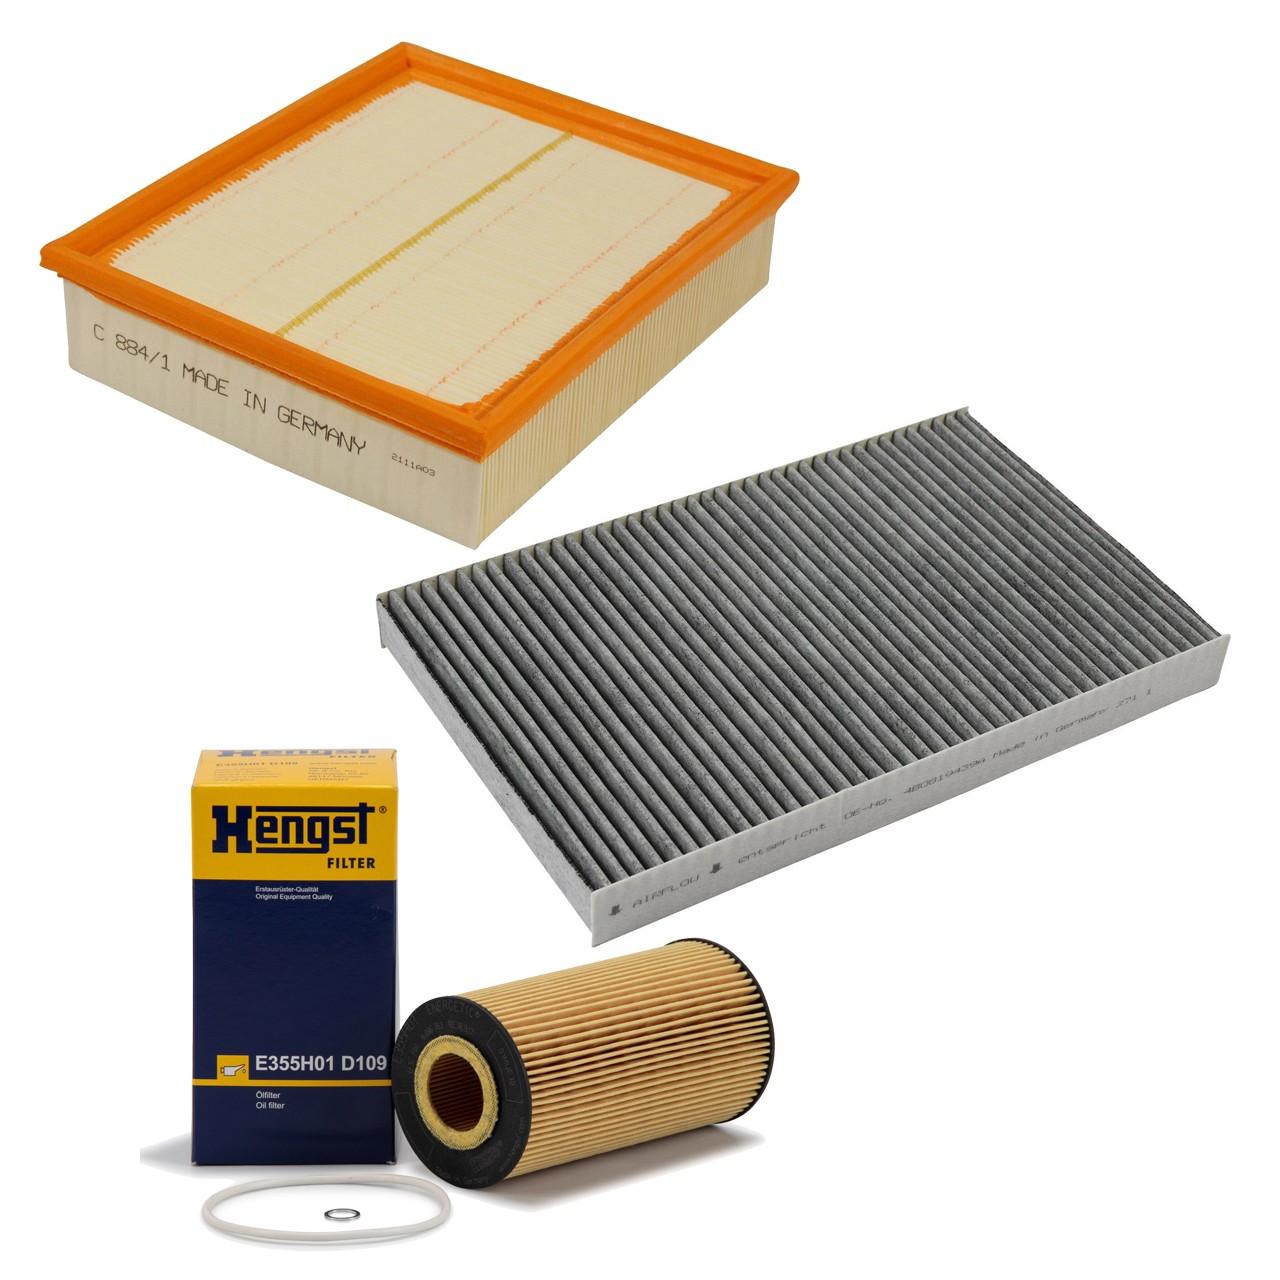 Inspektionskit Filterpaket AUDI Allroad 4B C5 4.2 V8 quattro 299 PS